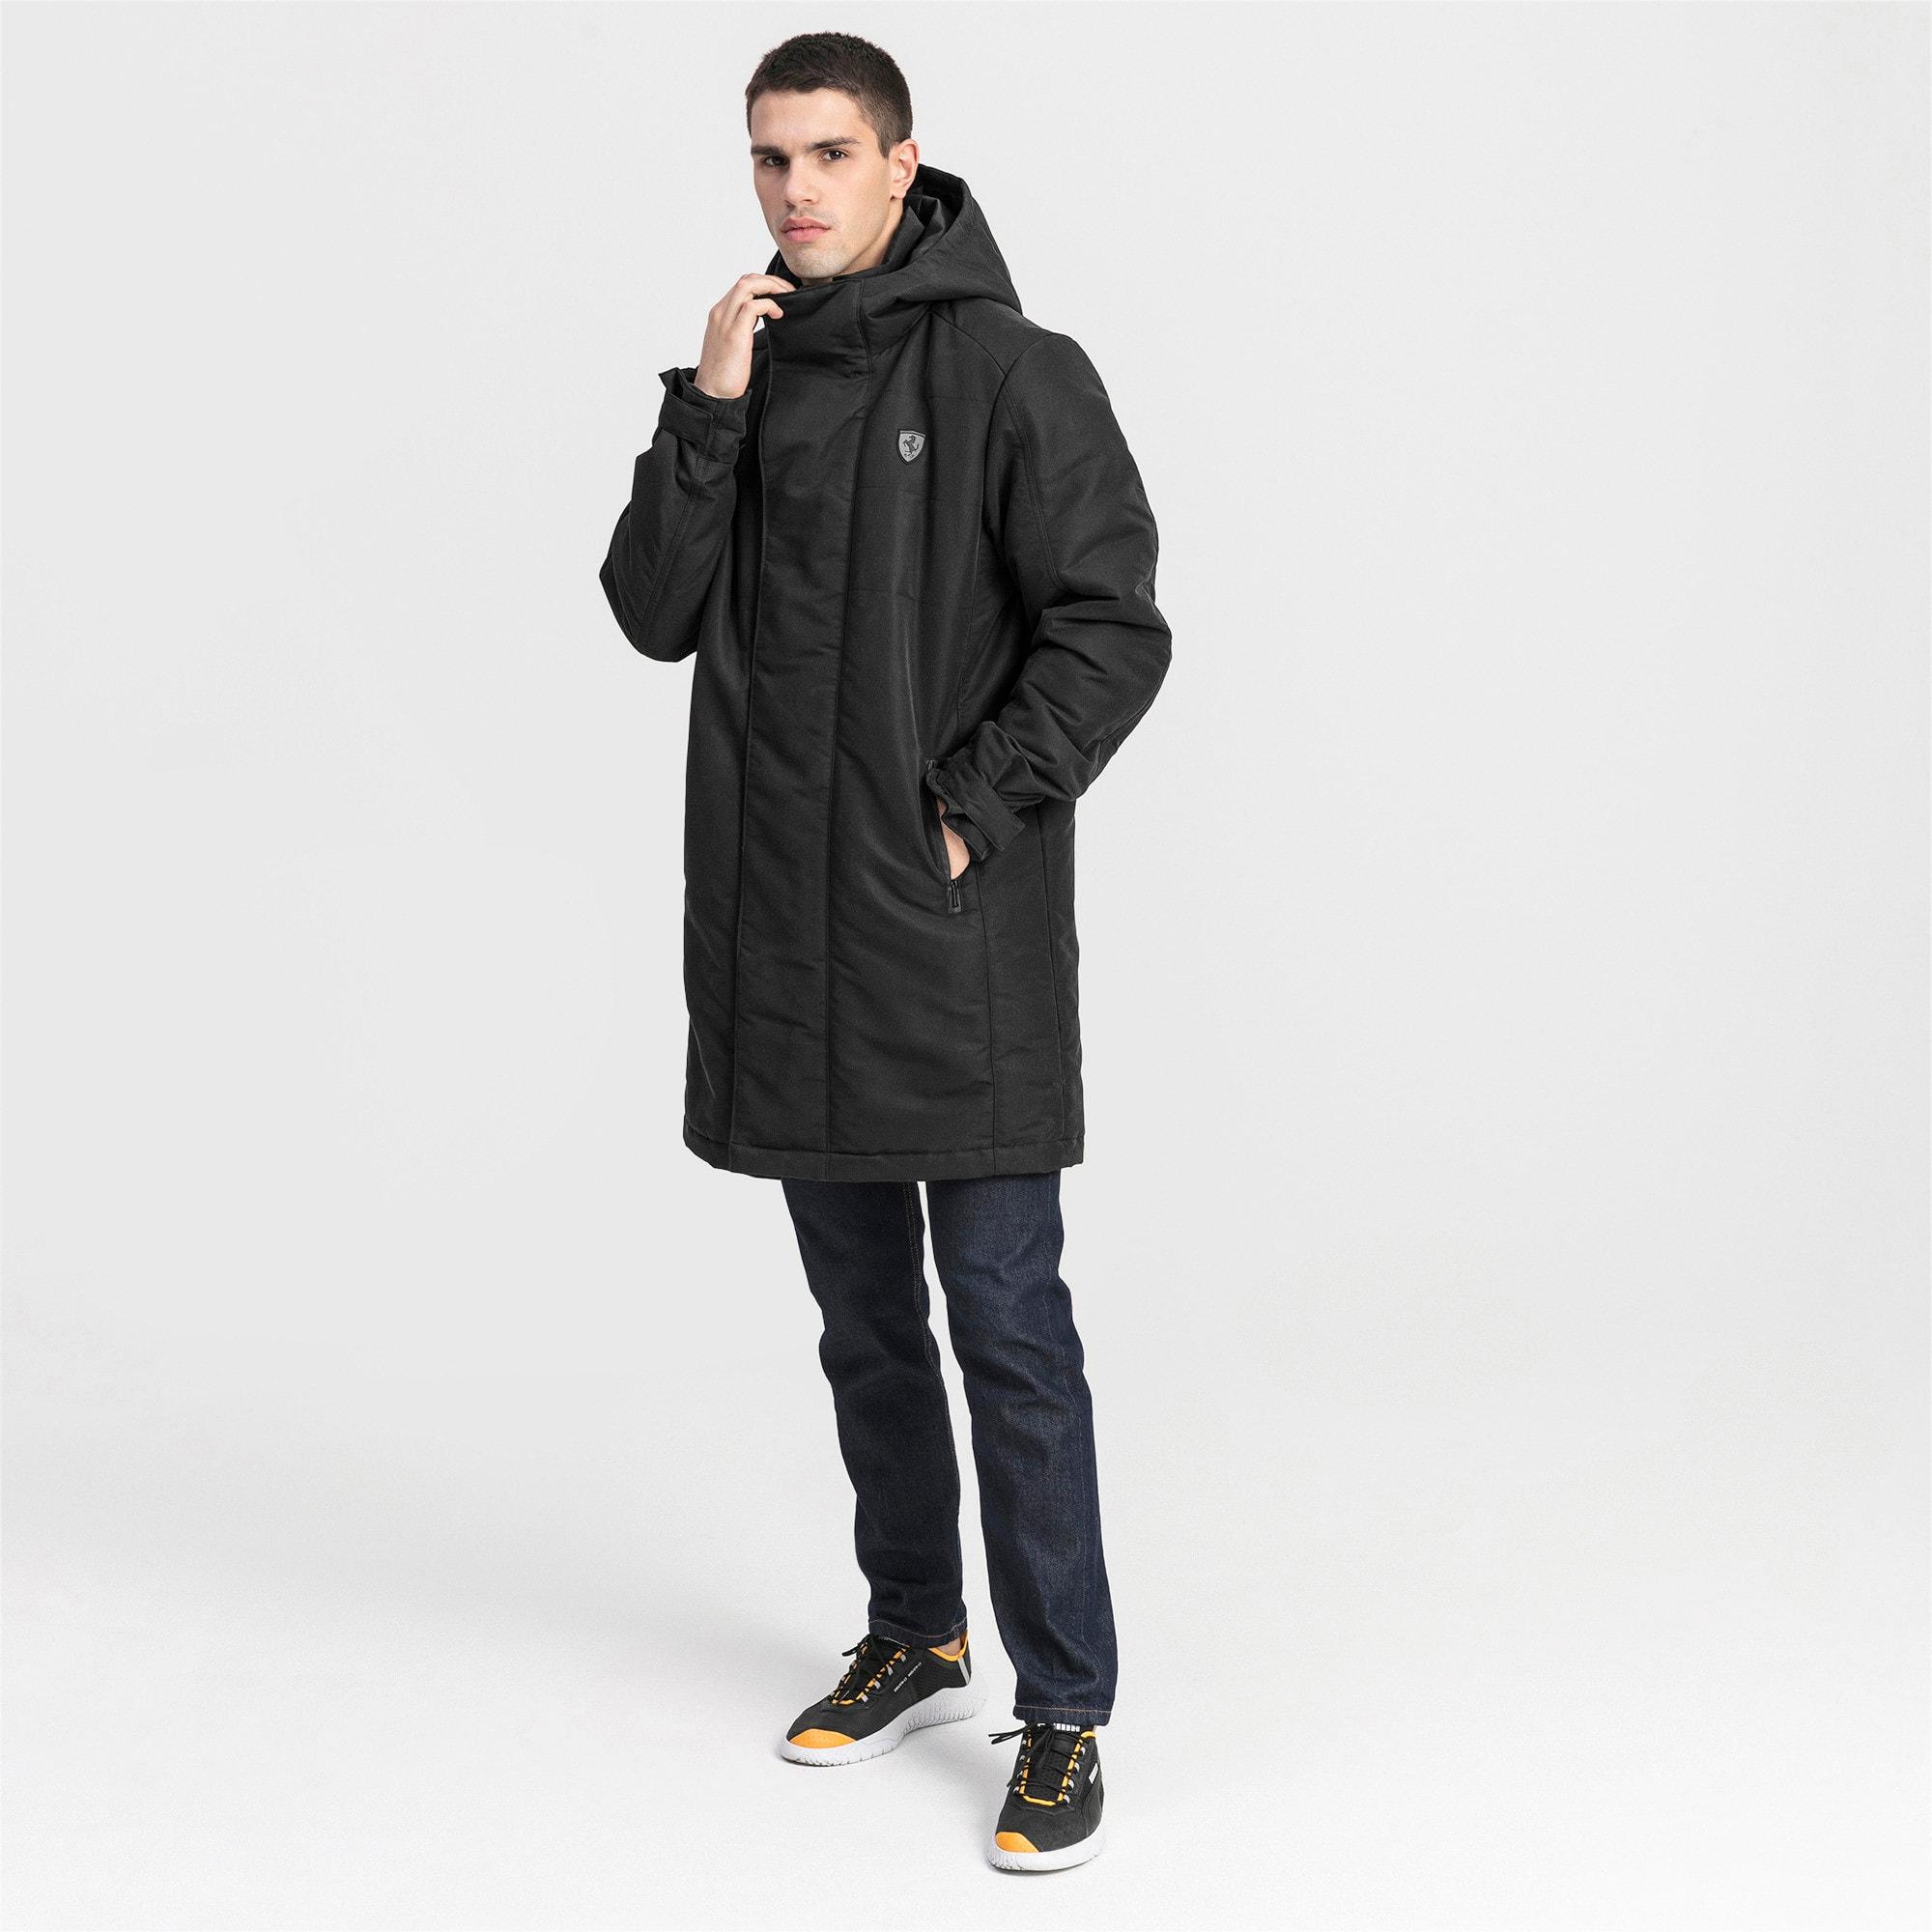 Thumbnail 3 van Ferrari RCT jas voor mannen, Puma Black, medium